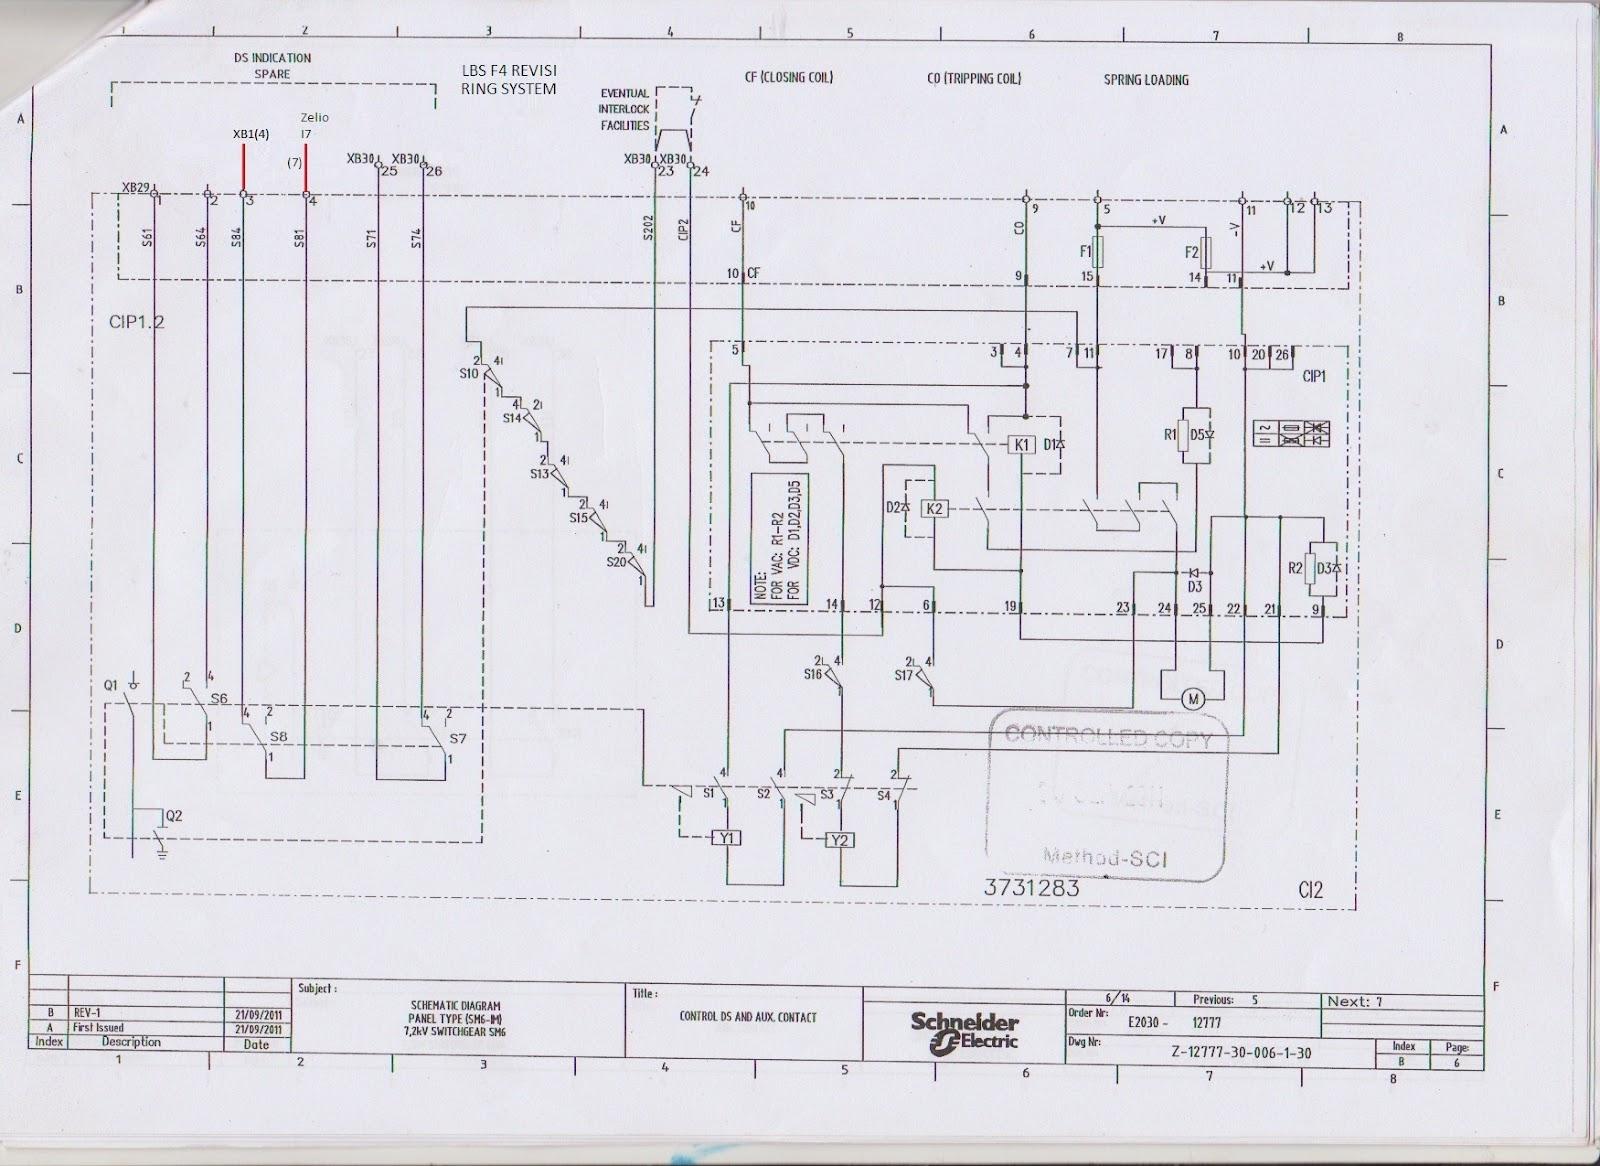 Blog pengalaman wiring diagram panel im motorize f4 panel ring sytem asfbconference2016 Choice Image